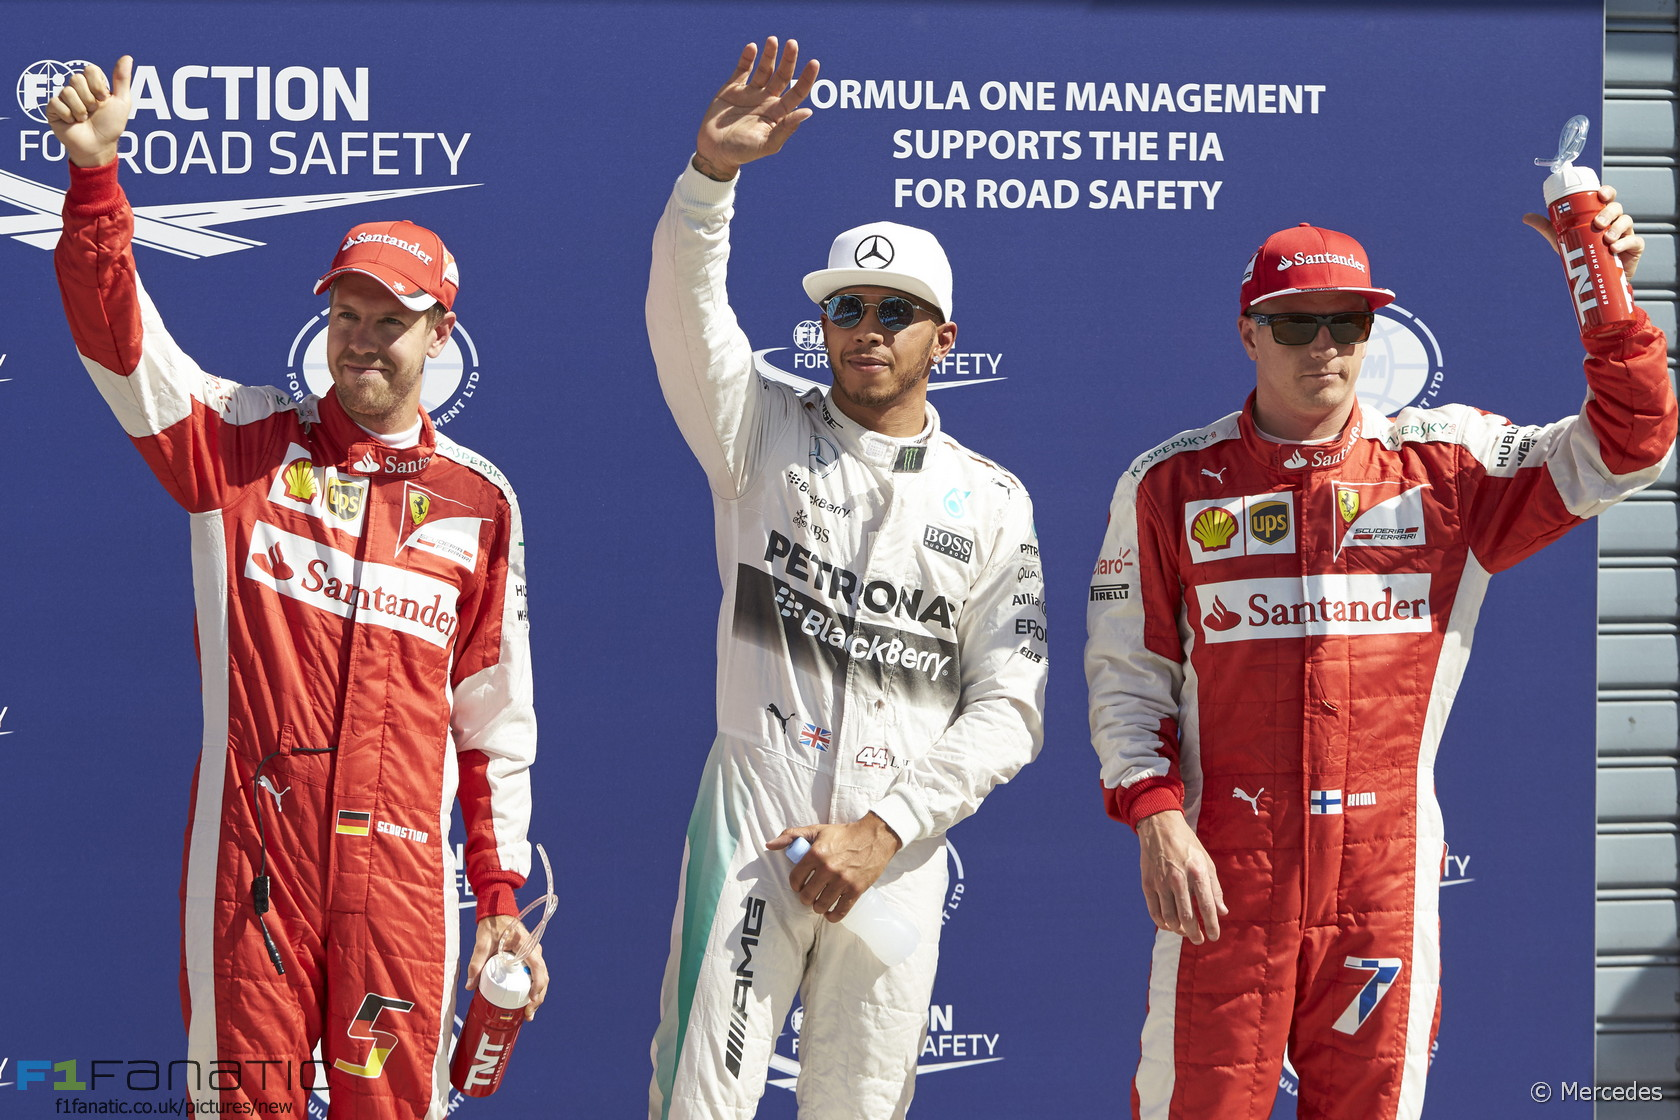 Sebastian Vettel, Lewis Hamilton, Kimi Raikkonen, Monza, 2015